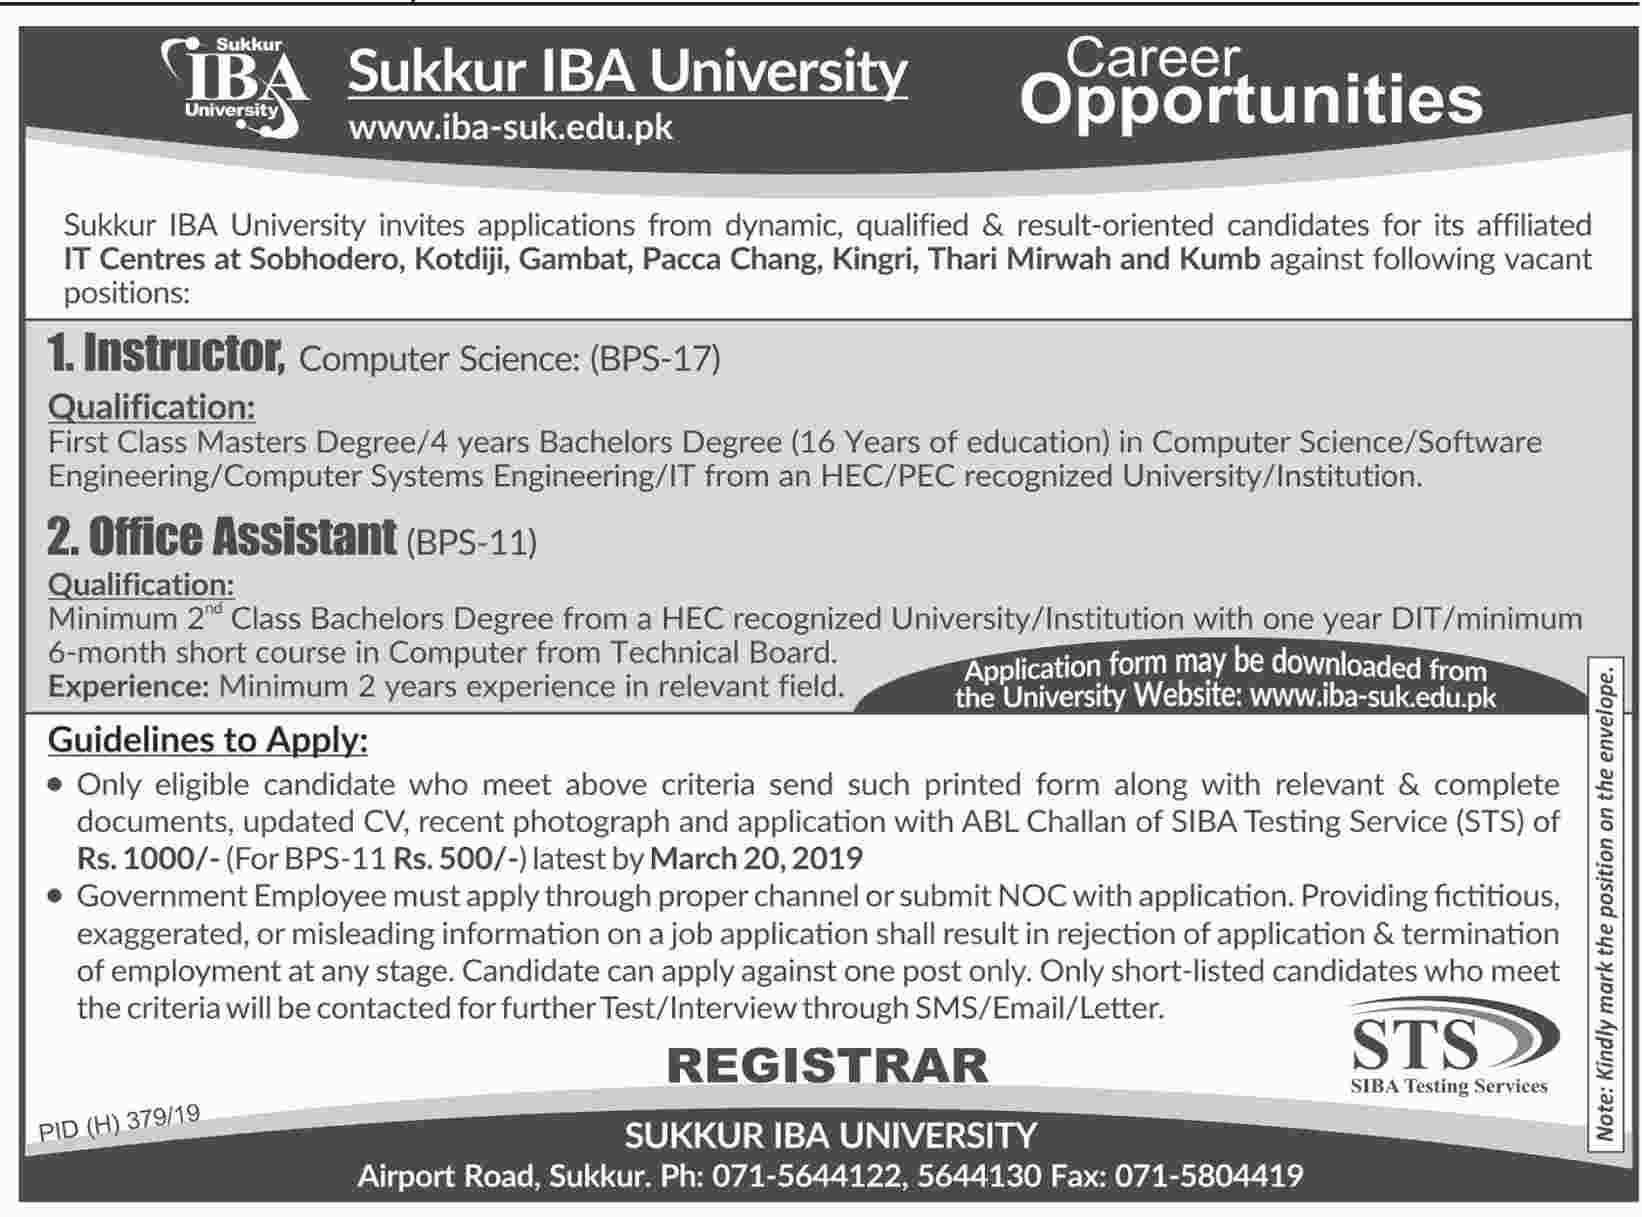 Sukkur IBA University Jobs 2019 Through STS